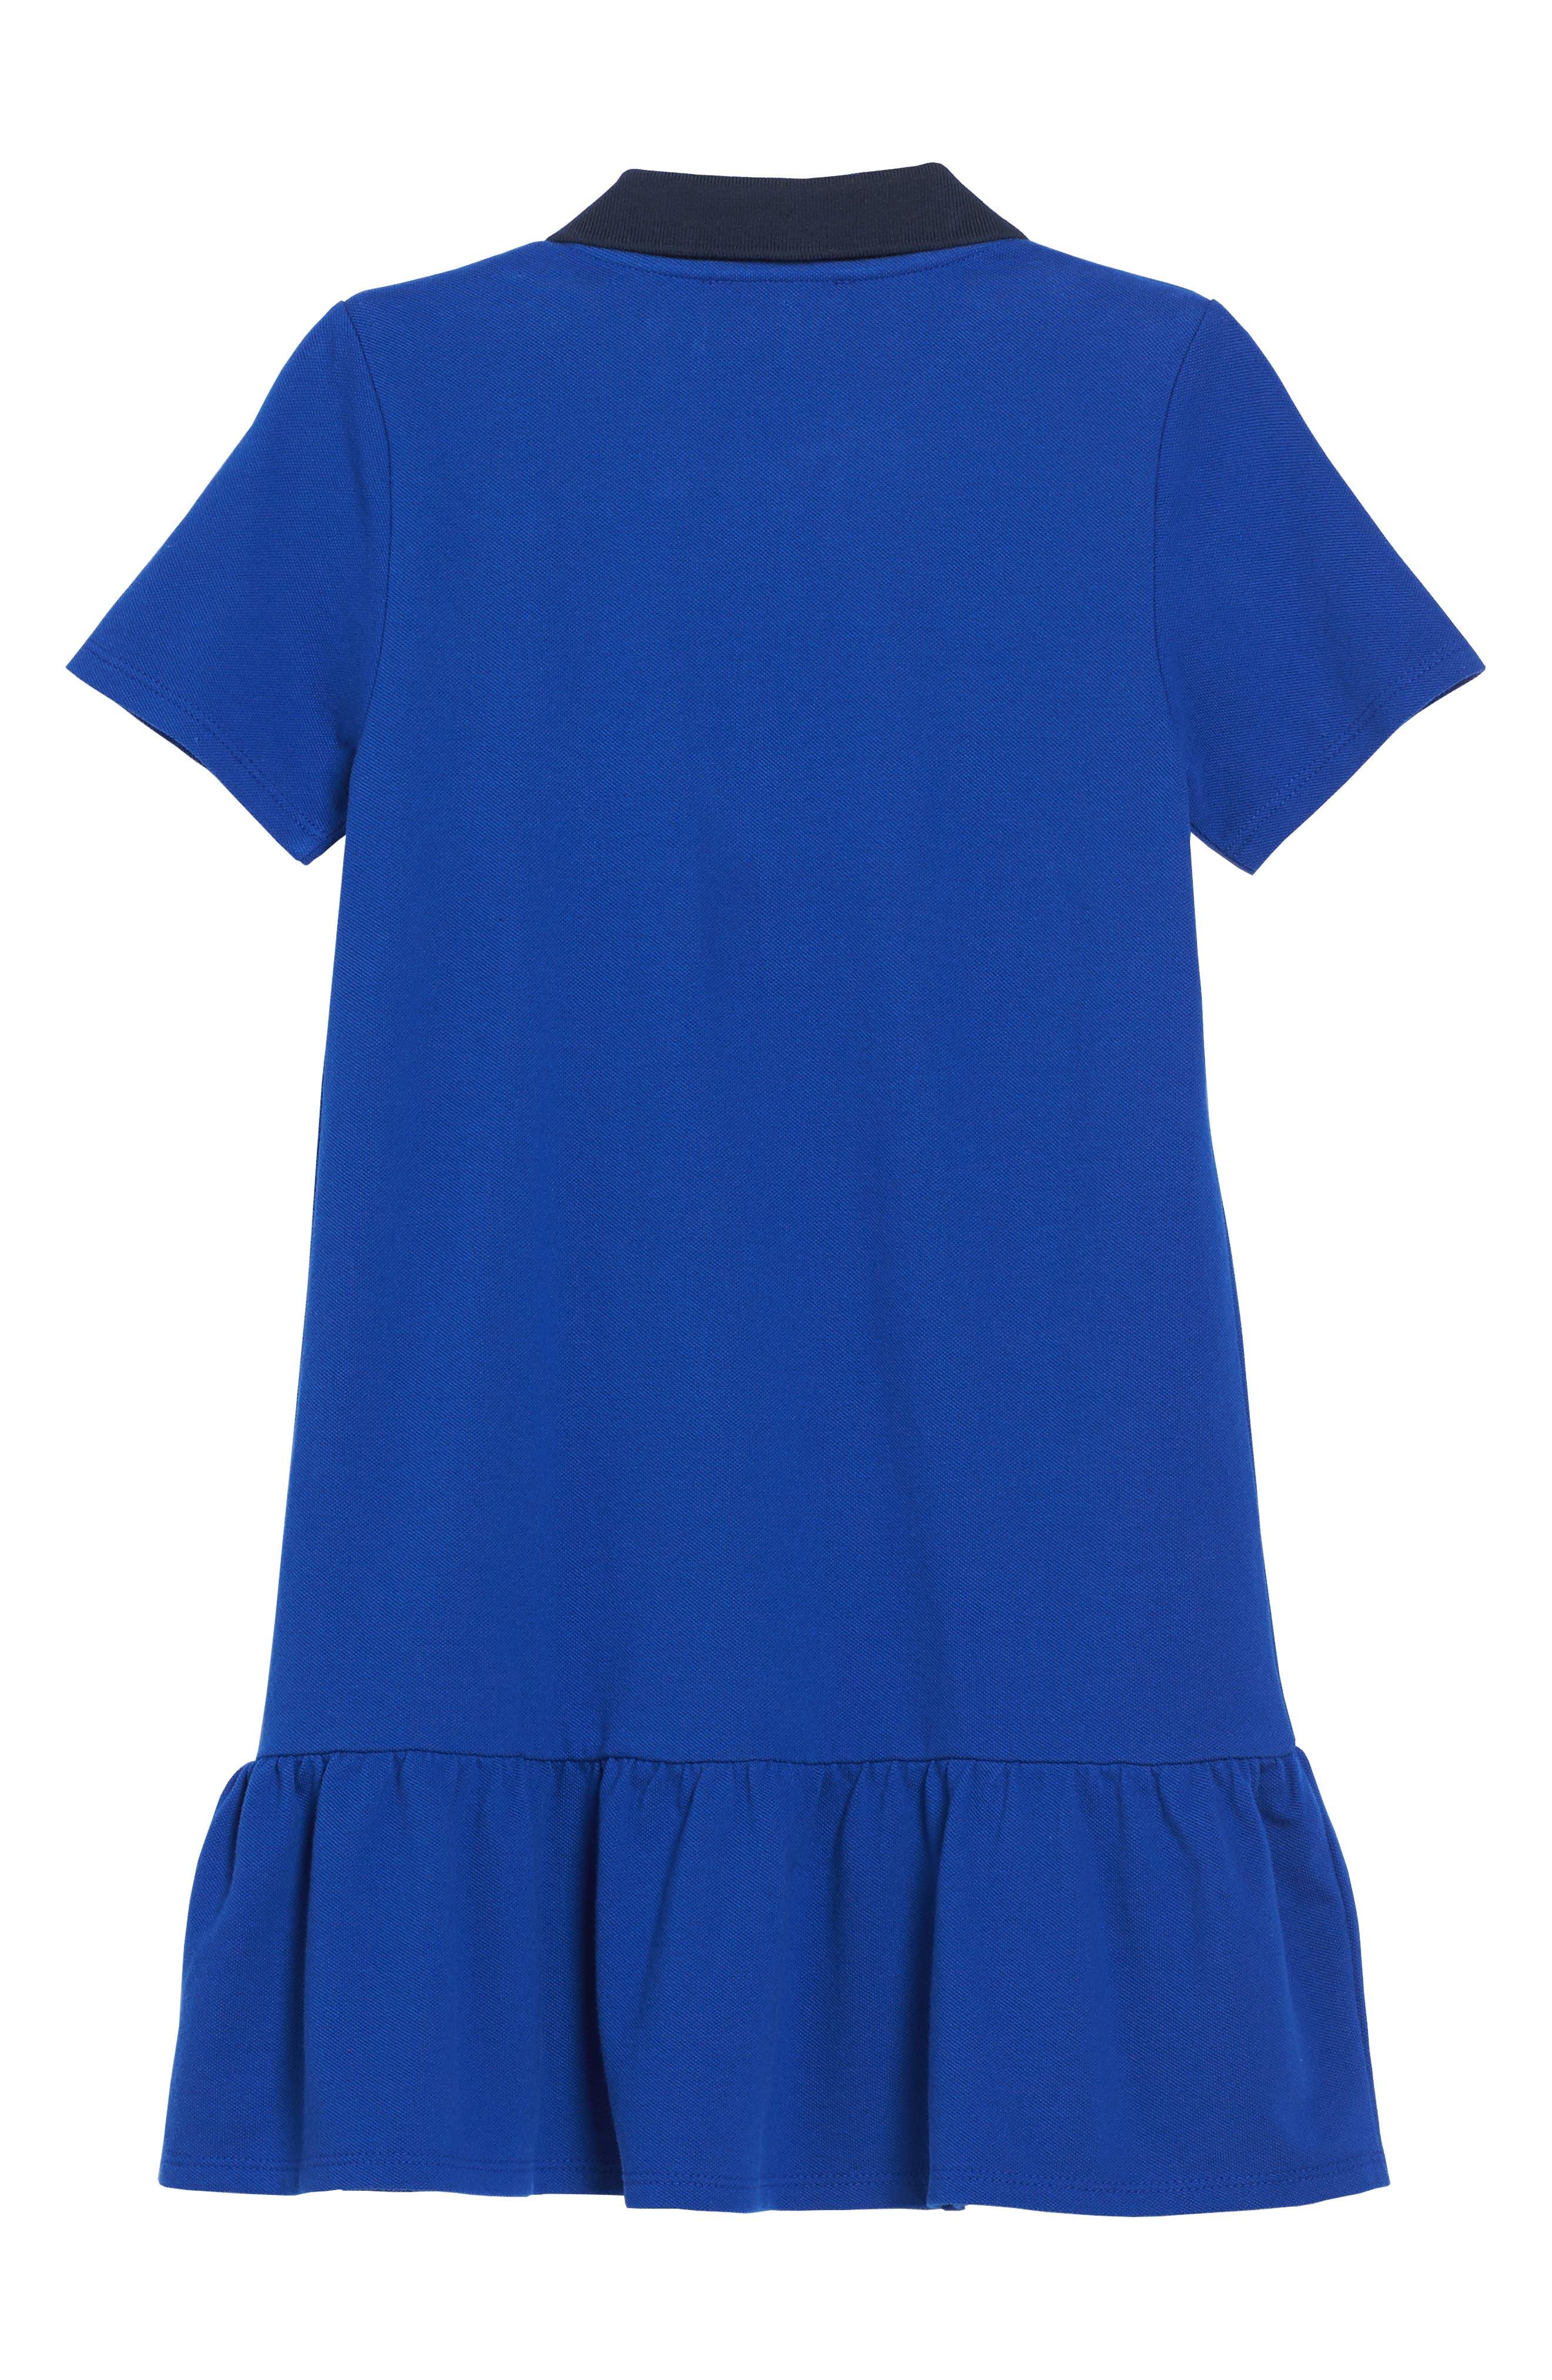 Piqué Polo Dress,                             Alternate thumbnail 2, color,                             Blue Night